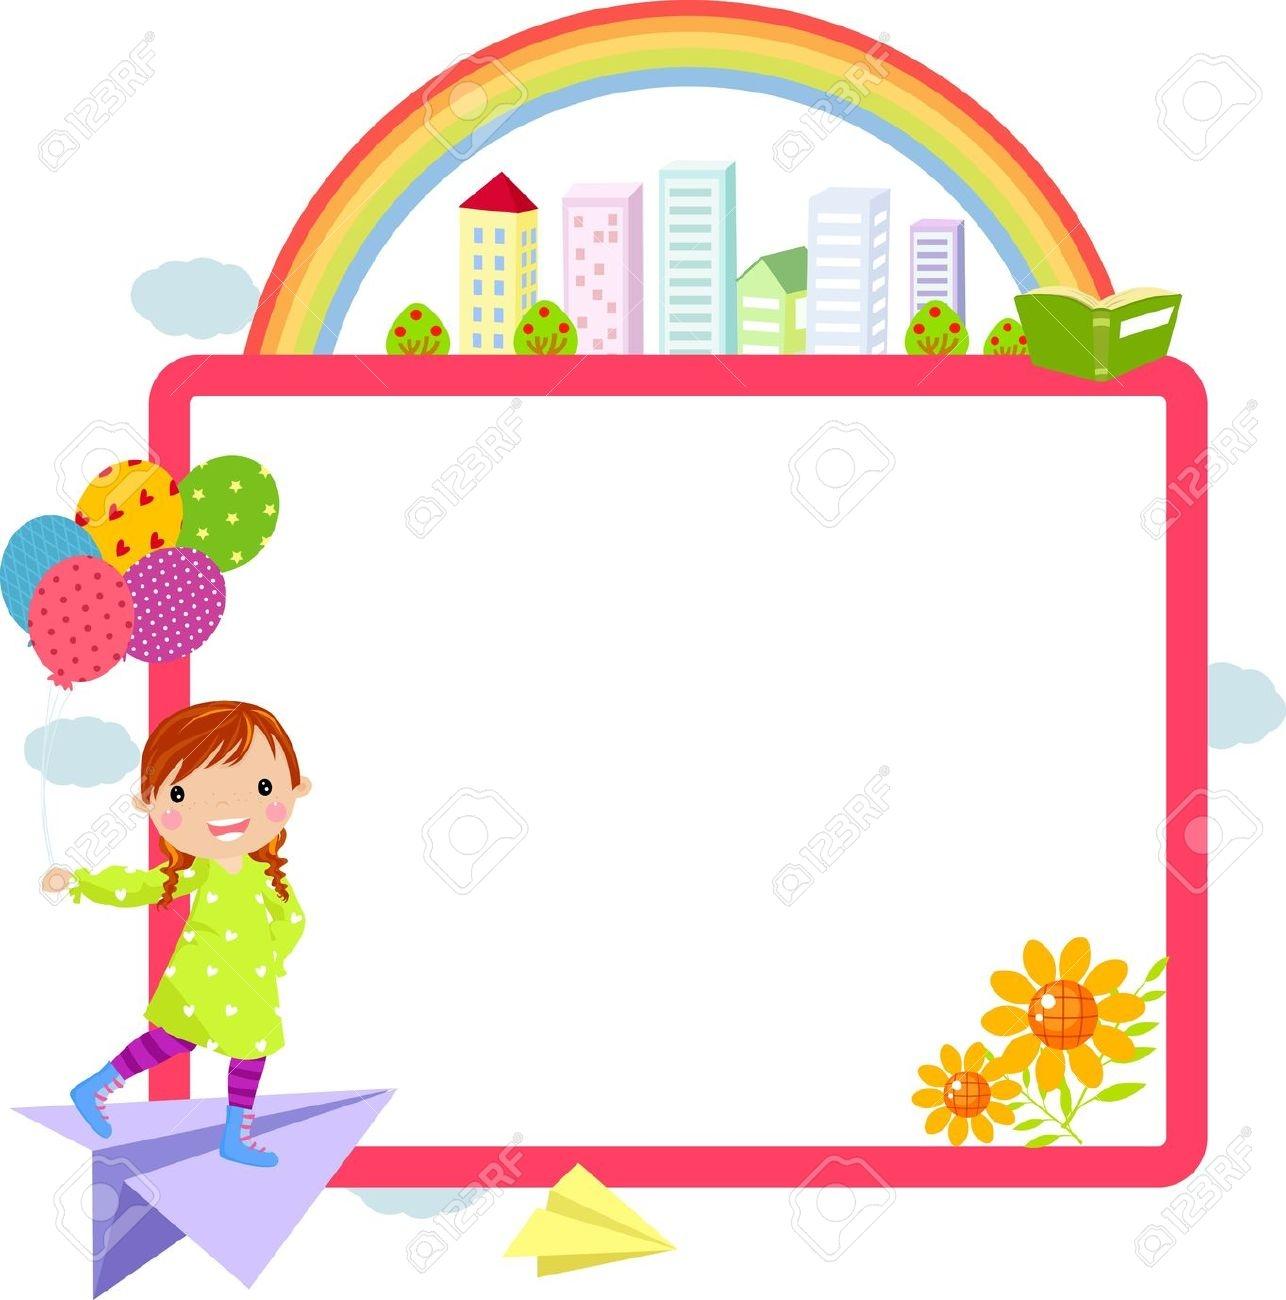 School Supplies Borders And Frames | Free download best School ...